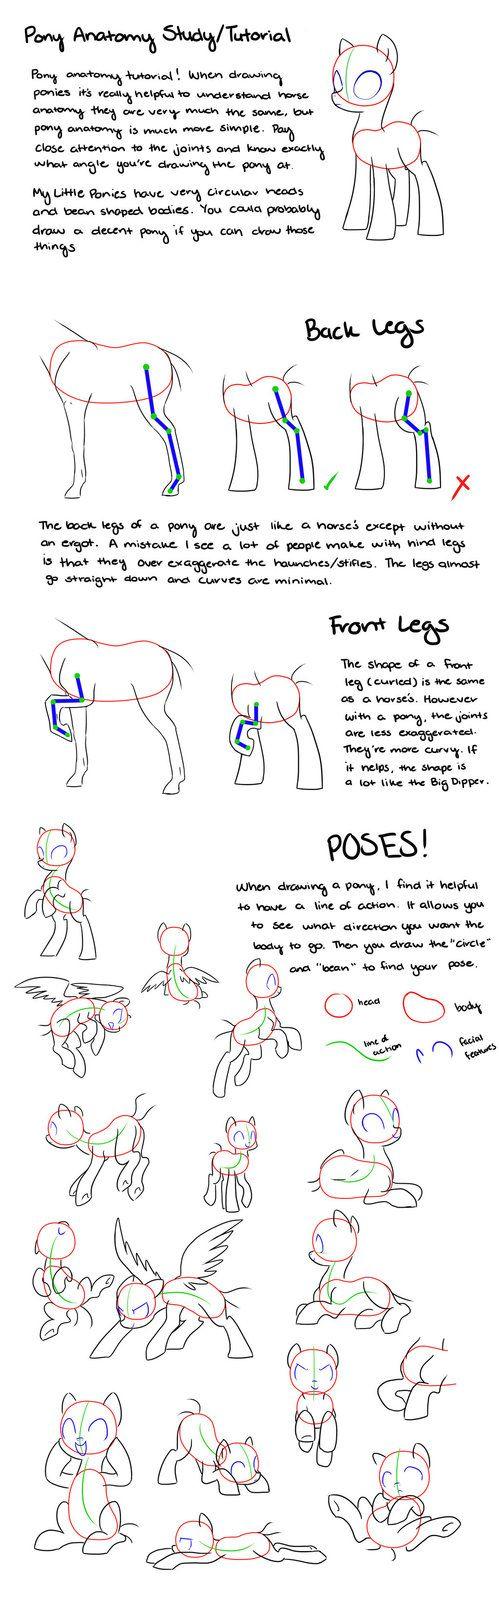 Pony Anatomy Tips/Study/Tutorial